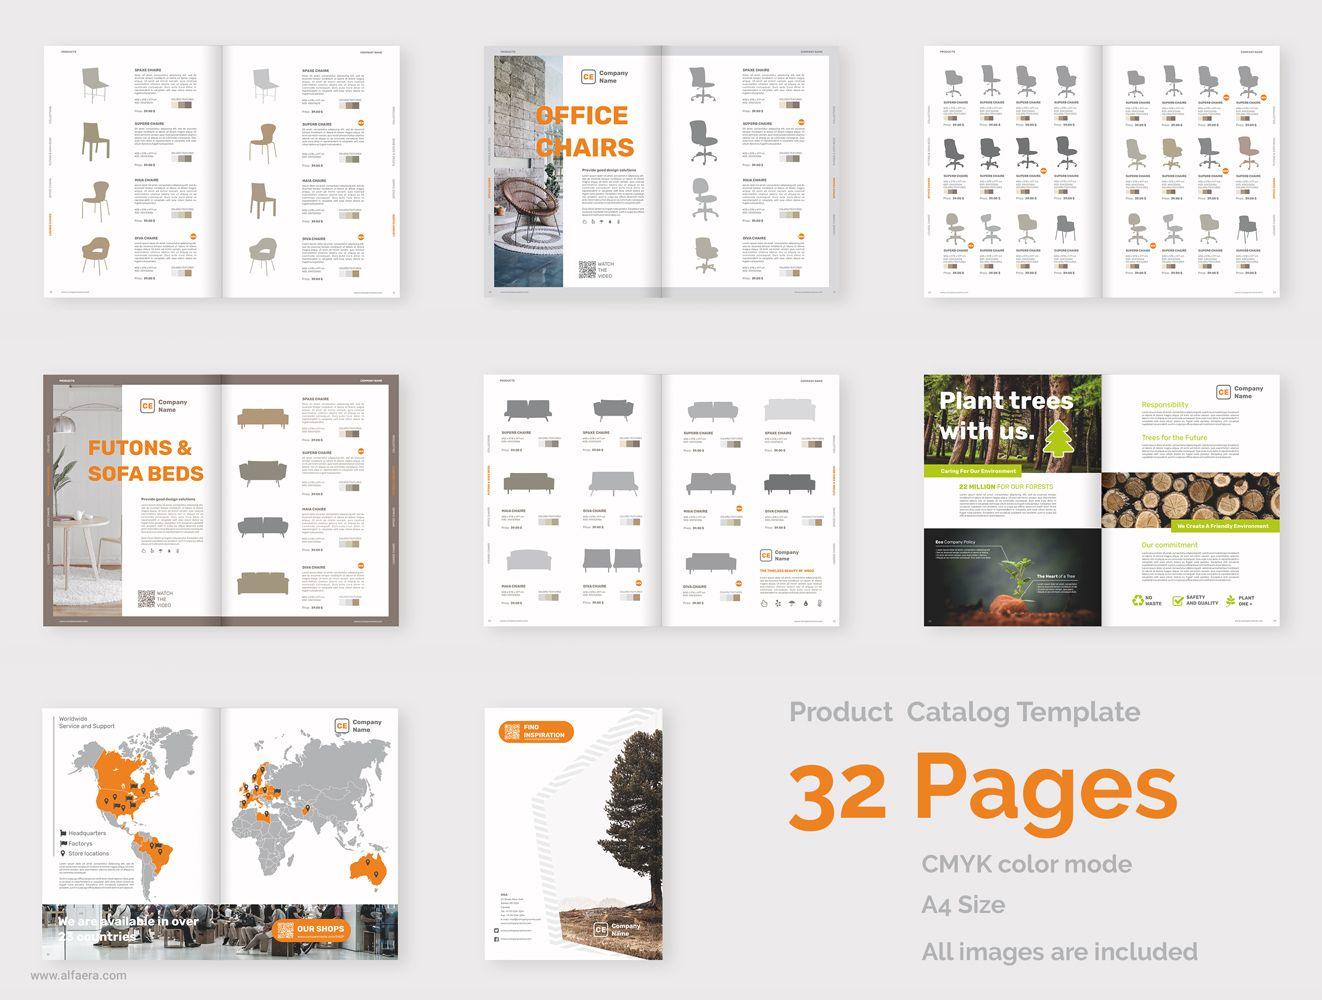 Product Catalog Brochure Template Coreldraw Alfaera Coreldraw Graphic Design Templates Brochure Template Product Catalog Template Graphic Design Templates Product catalogue templates free download